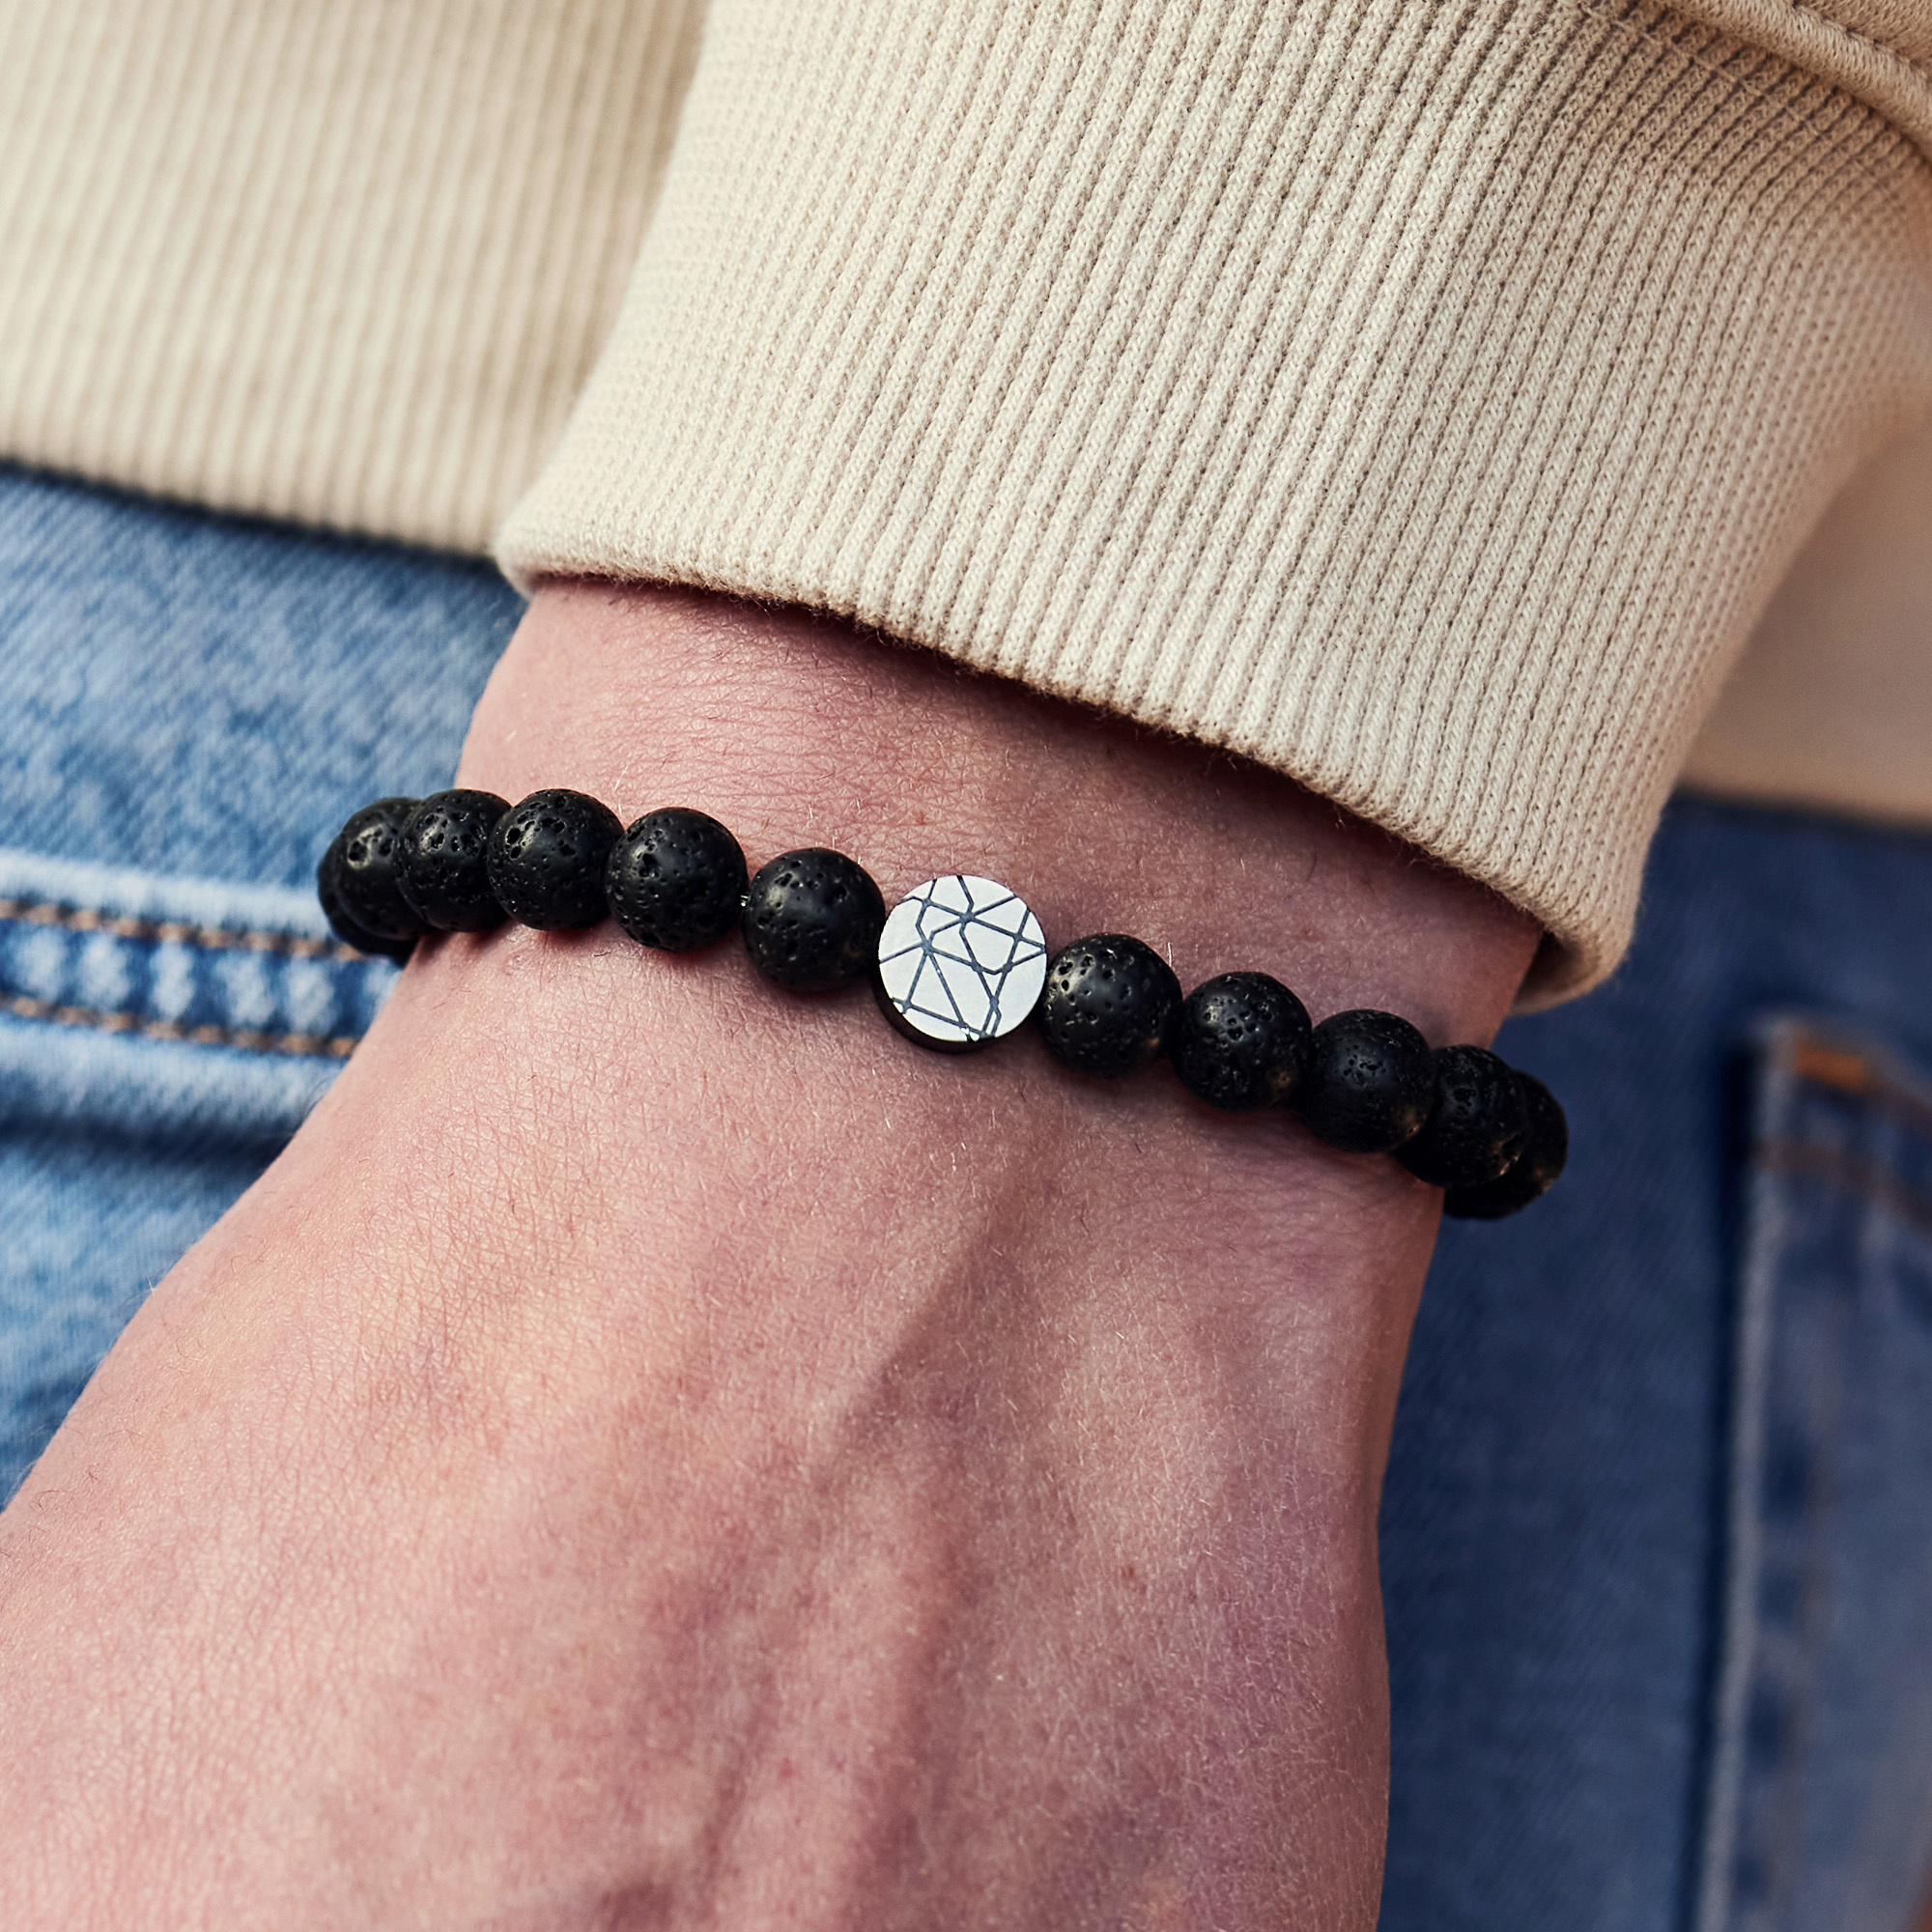 Sem Lewis Sem's Present zaino nero e braccialetto